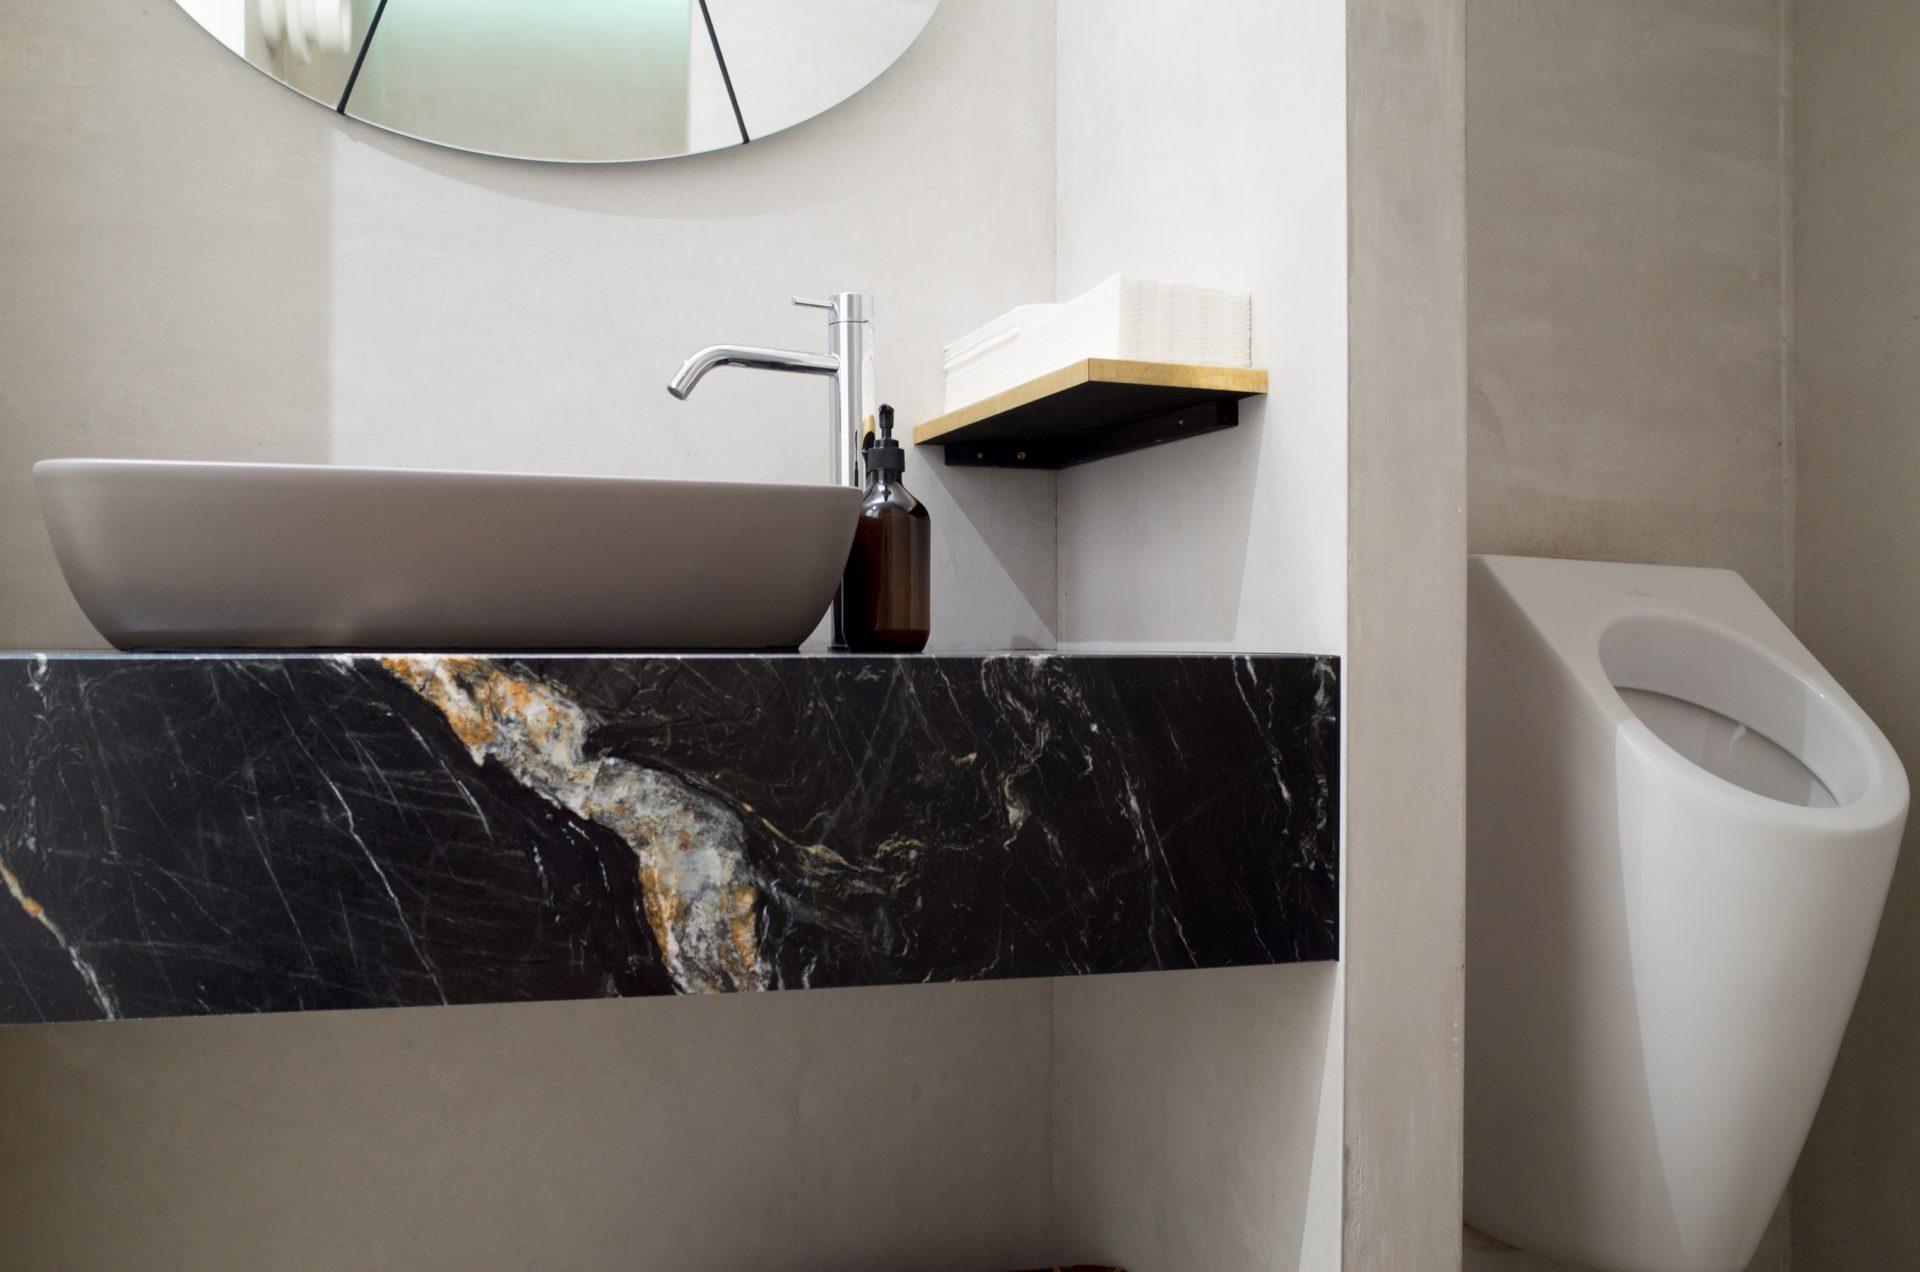 realizacja berli ski bar coda design biznes azienki. Black Bedroom Furniture Sets. Home Design Ideas